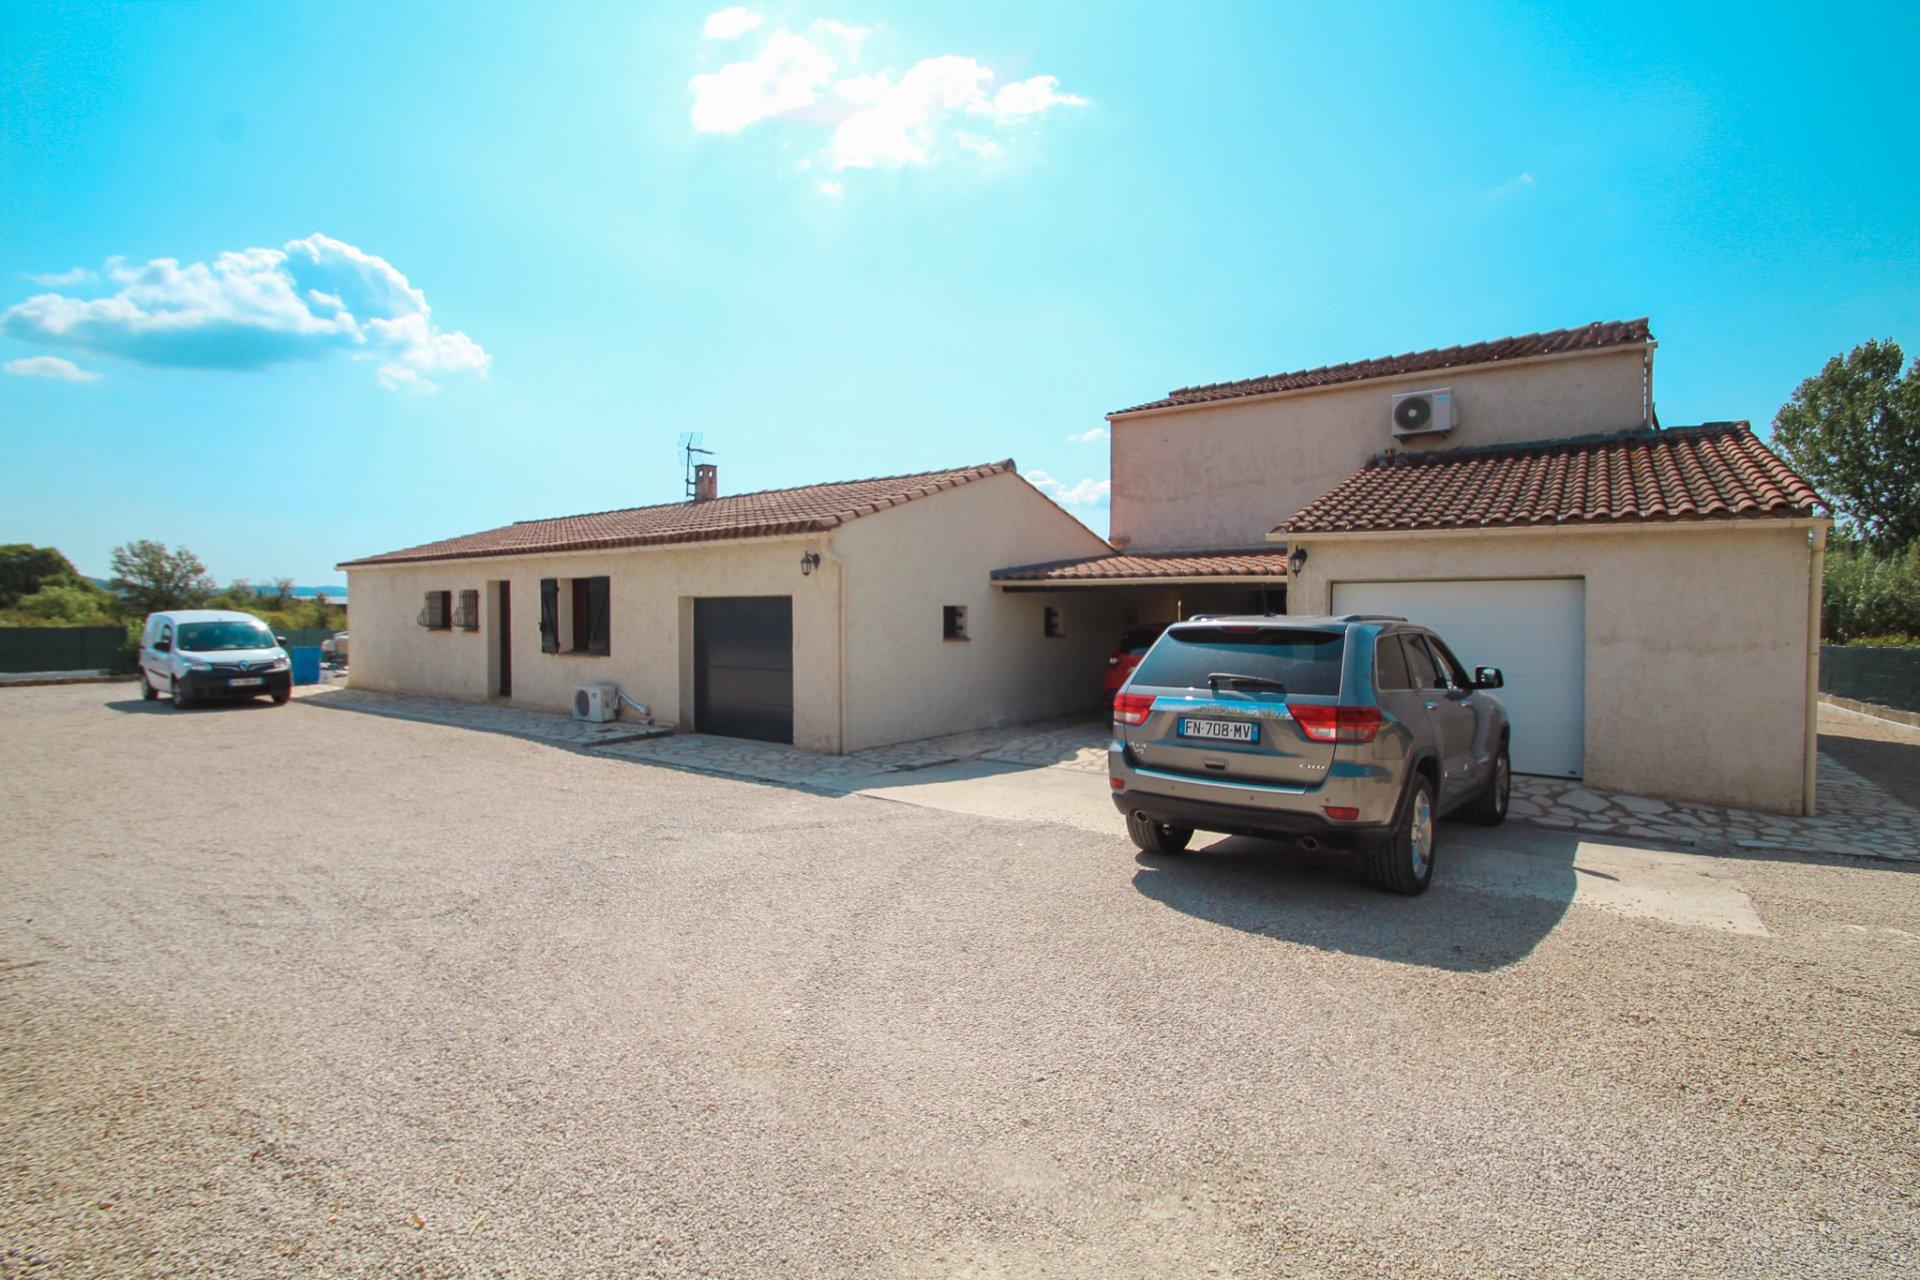 Bien comprenant: 2 villas 2 garages et une piscine